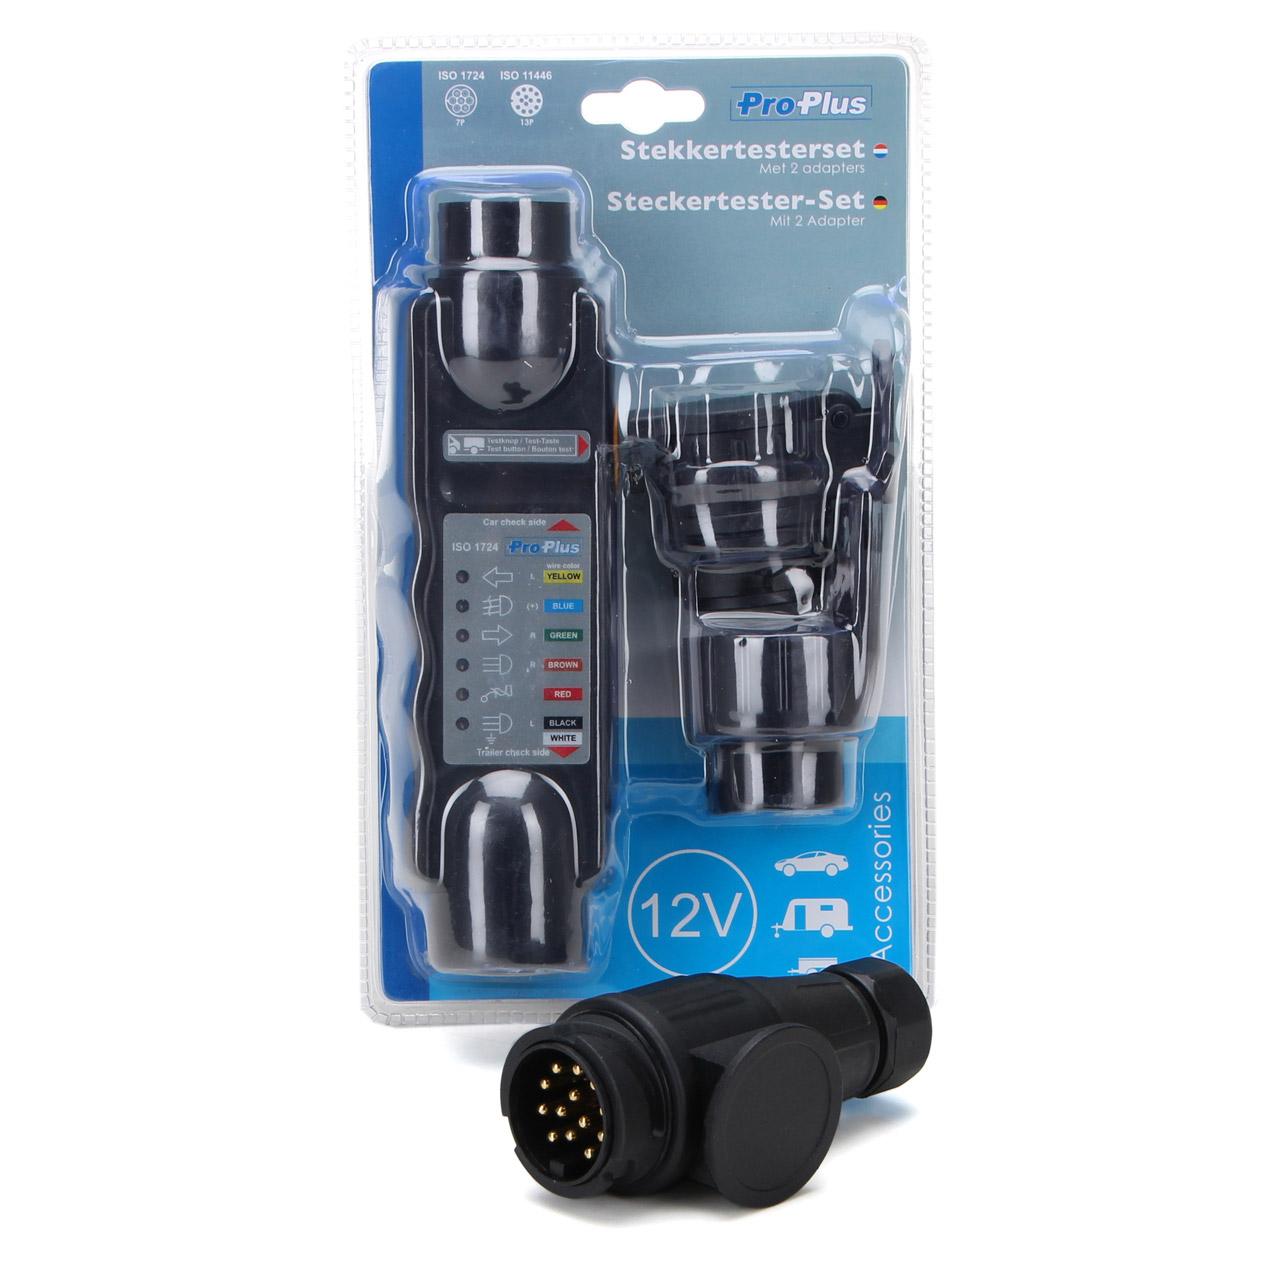 PROPLUS Steckertester-Set Beleuchtungstester + Anhängerstecker 13-polig